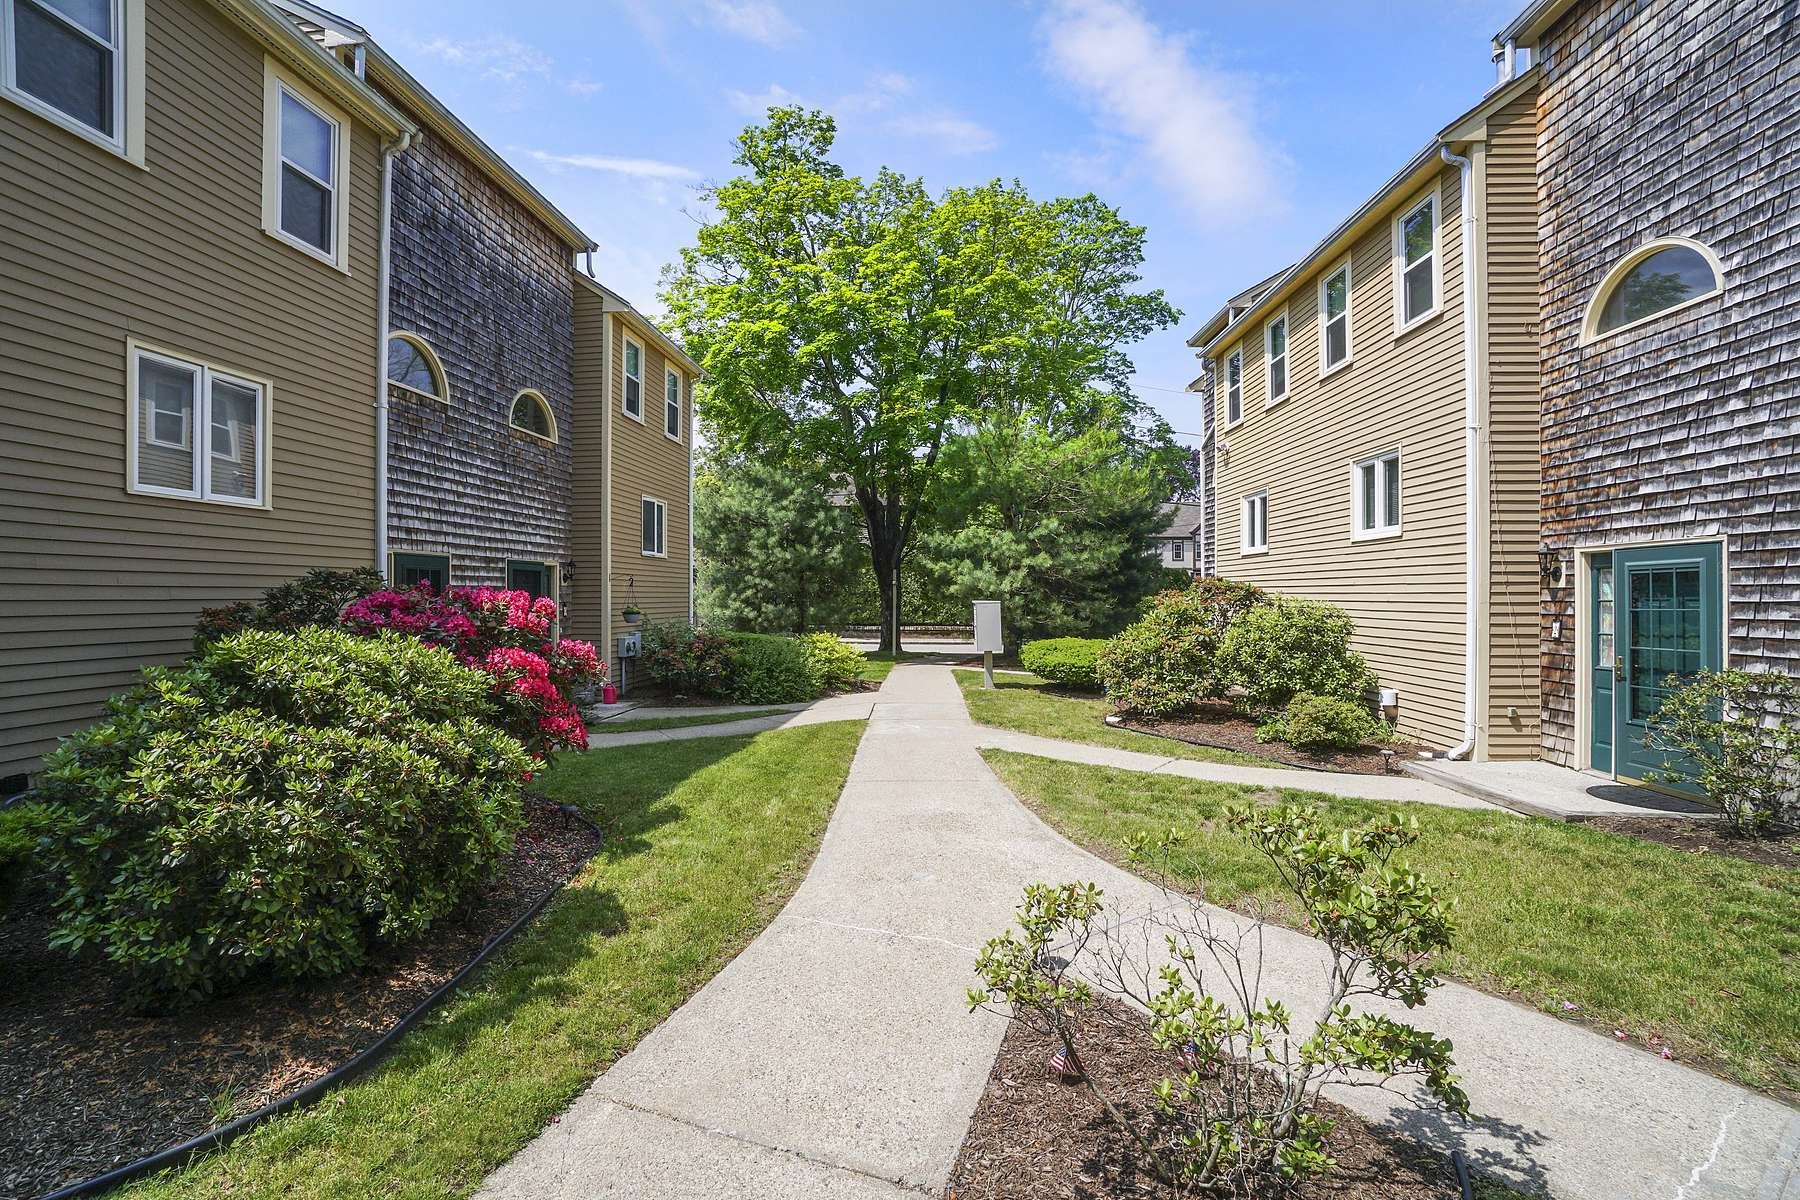 Condominiums for Sale at Capron Woods 2 13th St 4 Attleboro, Massachusetts 02703 United States